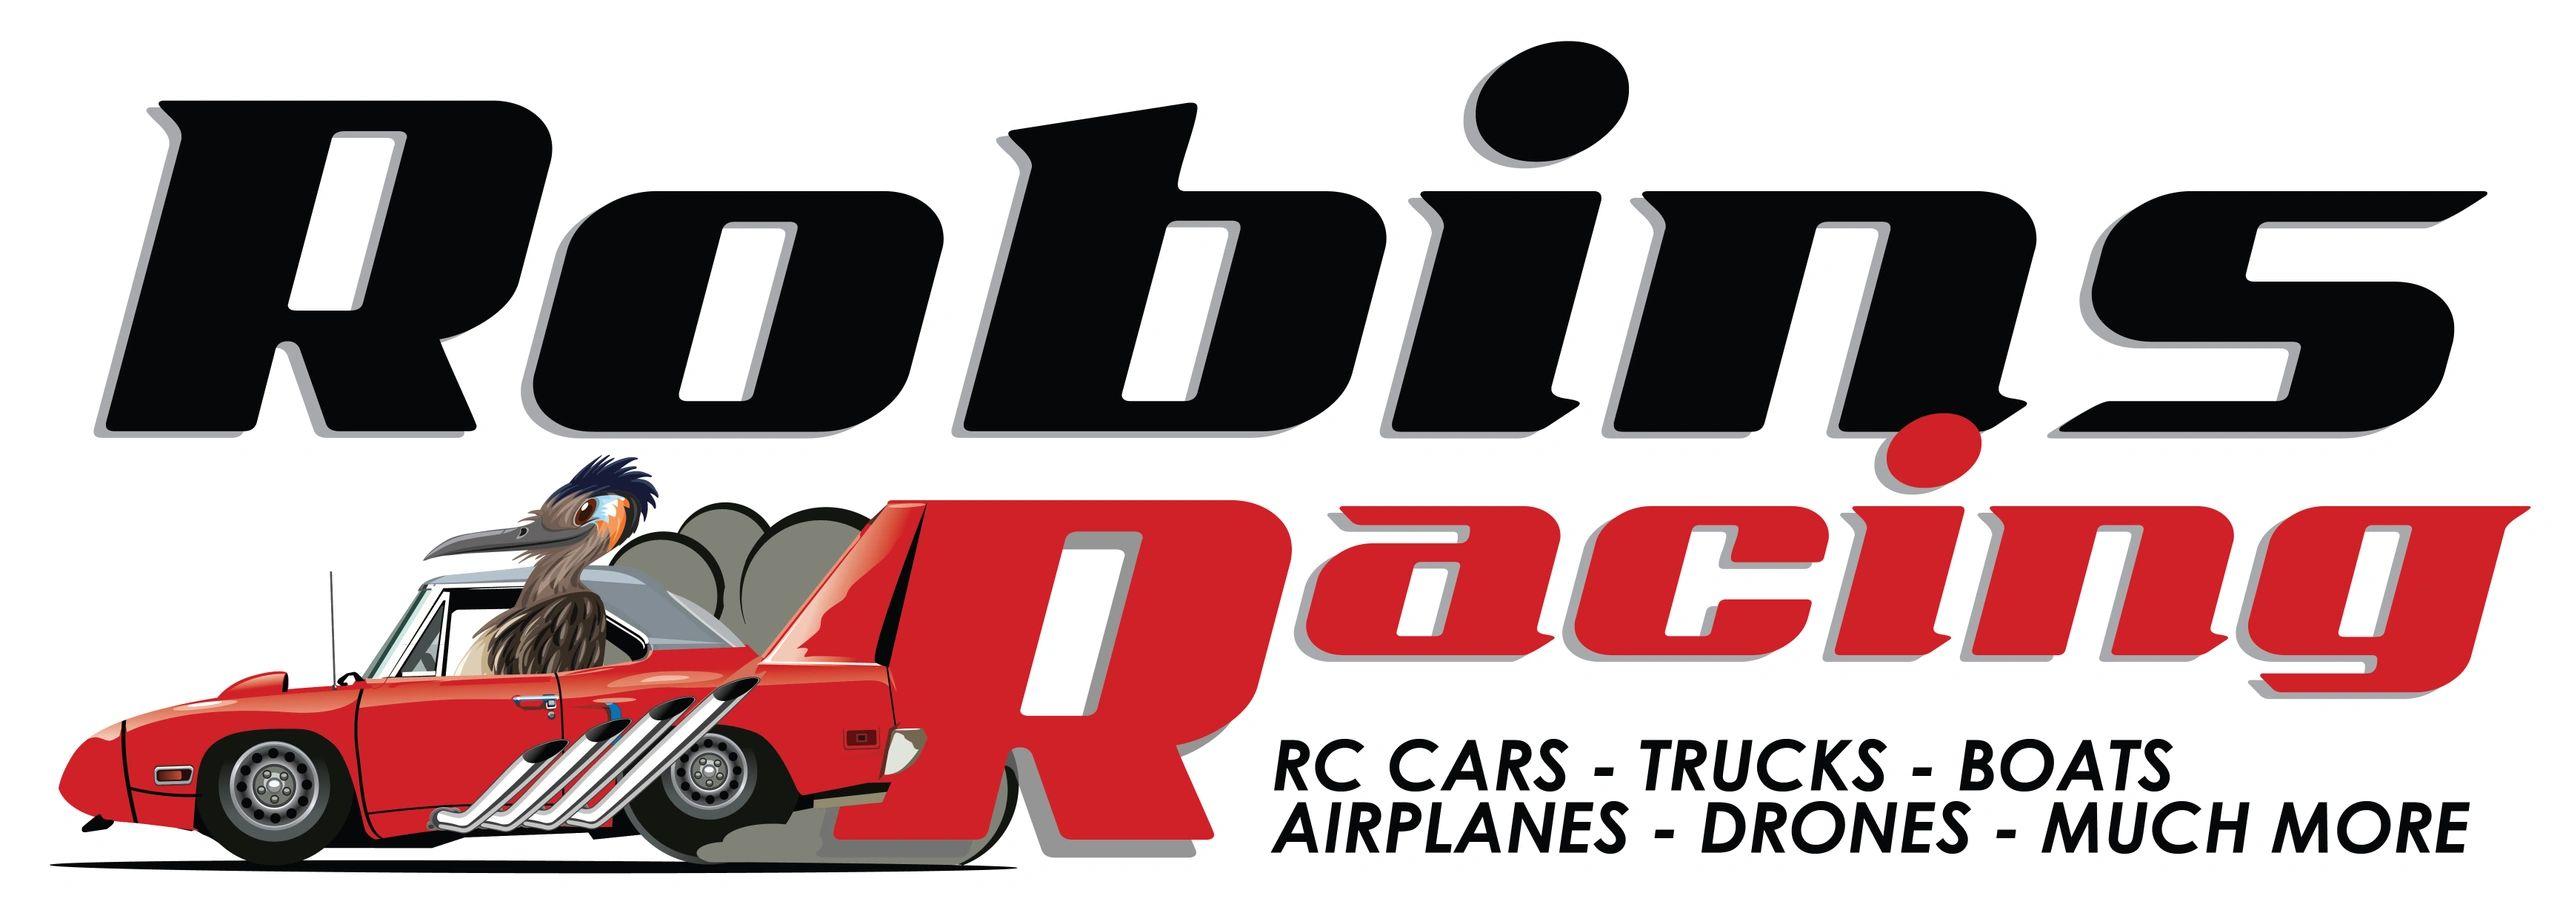 Car Dealerships In Warner Robins Ga >> Remote Control Hobby Shop Robins Racing Warner Robins